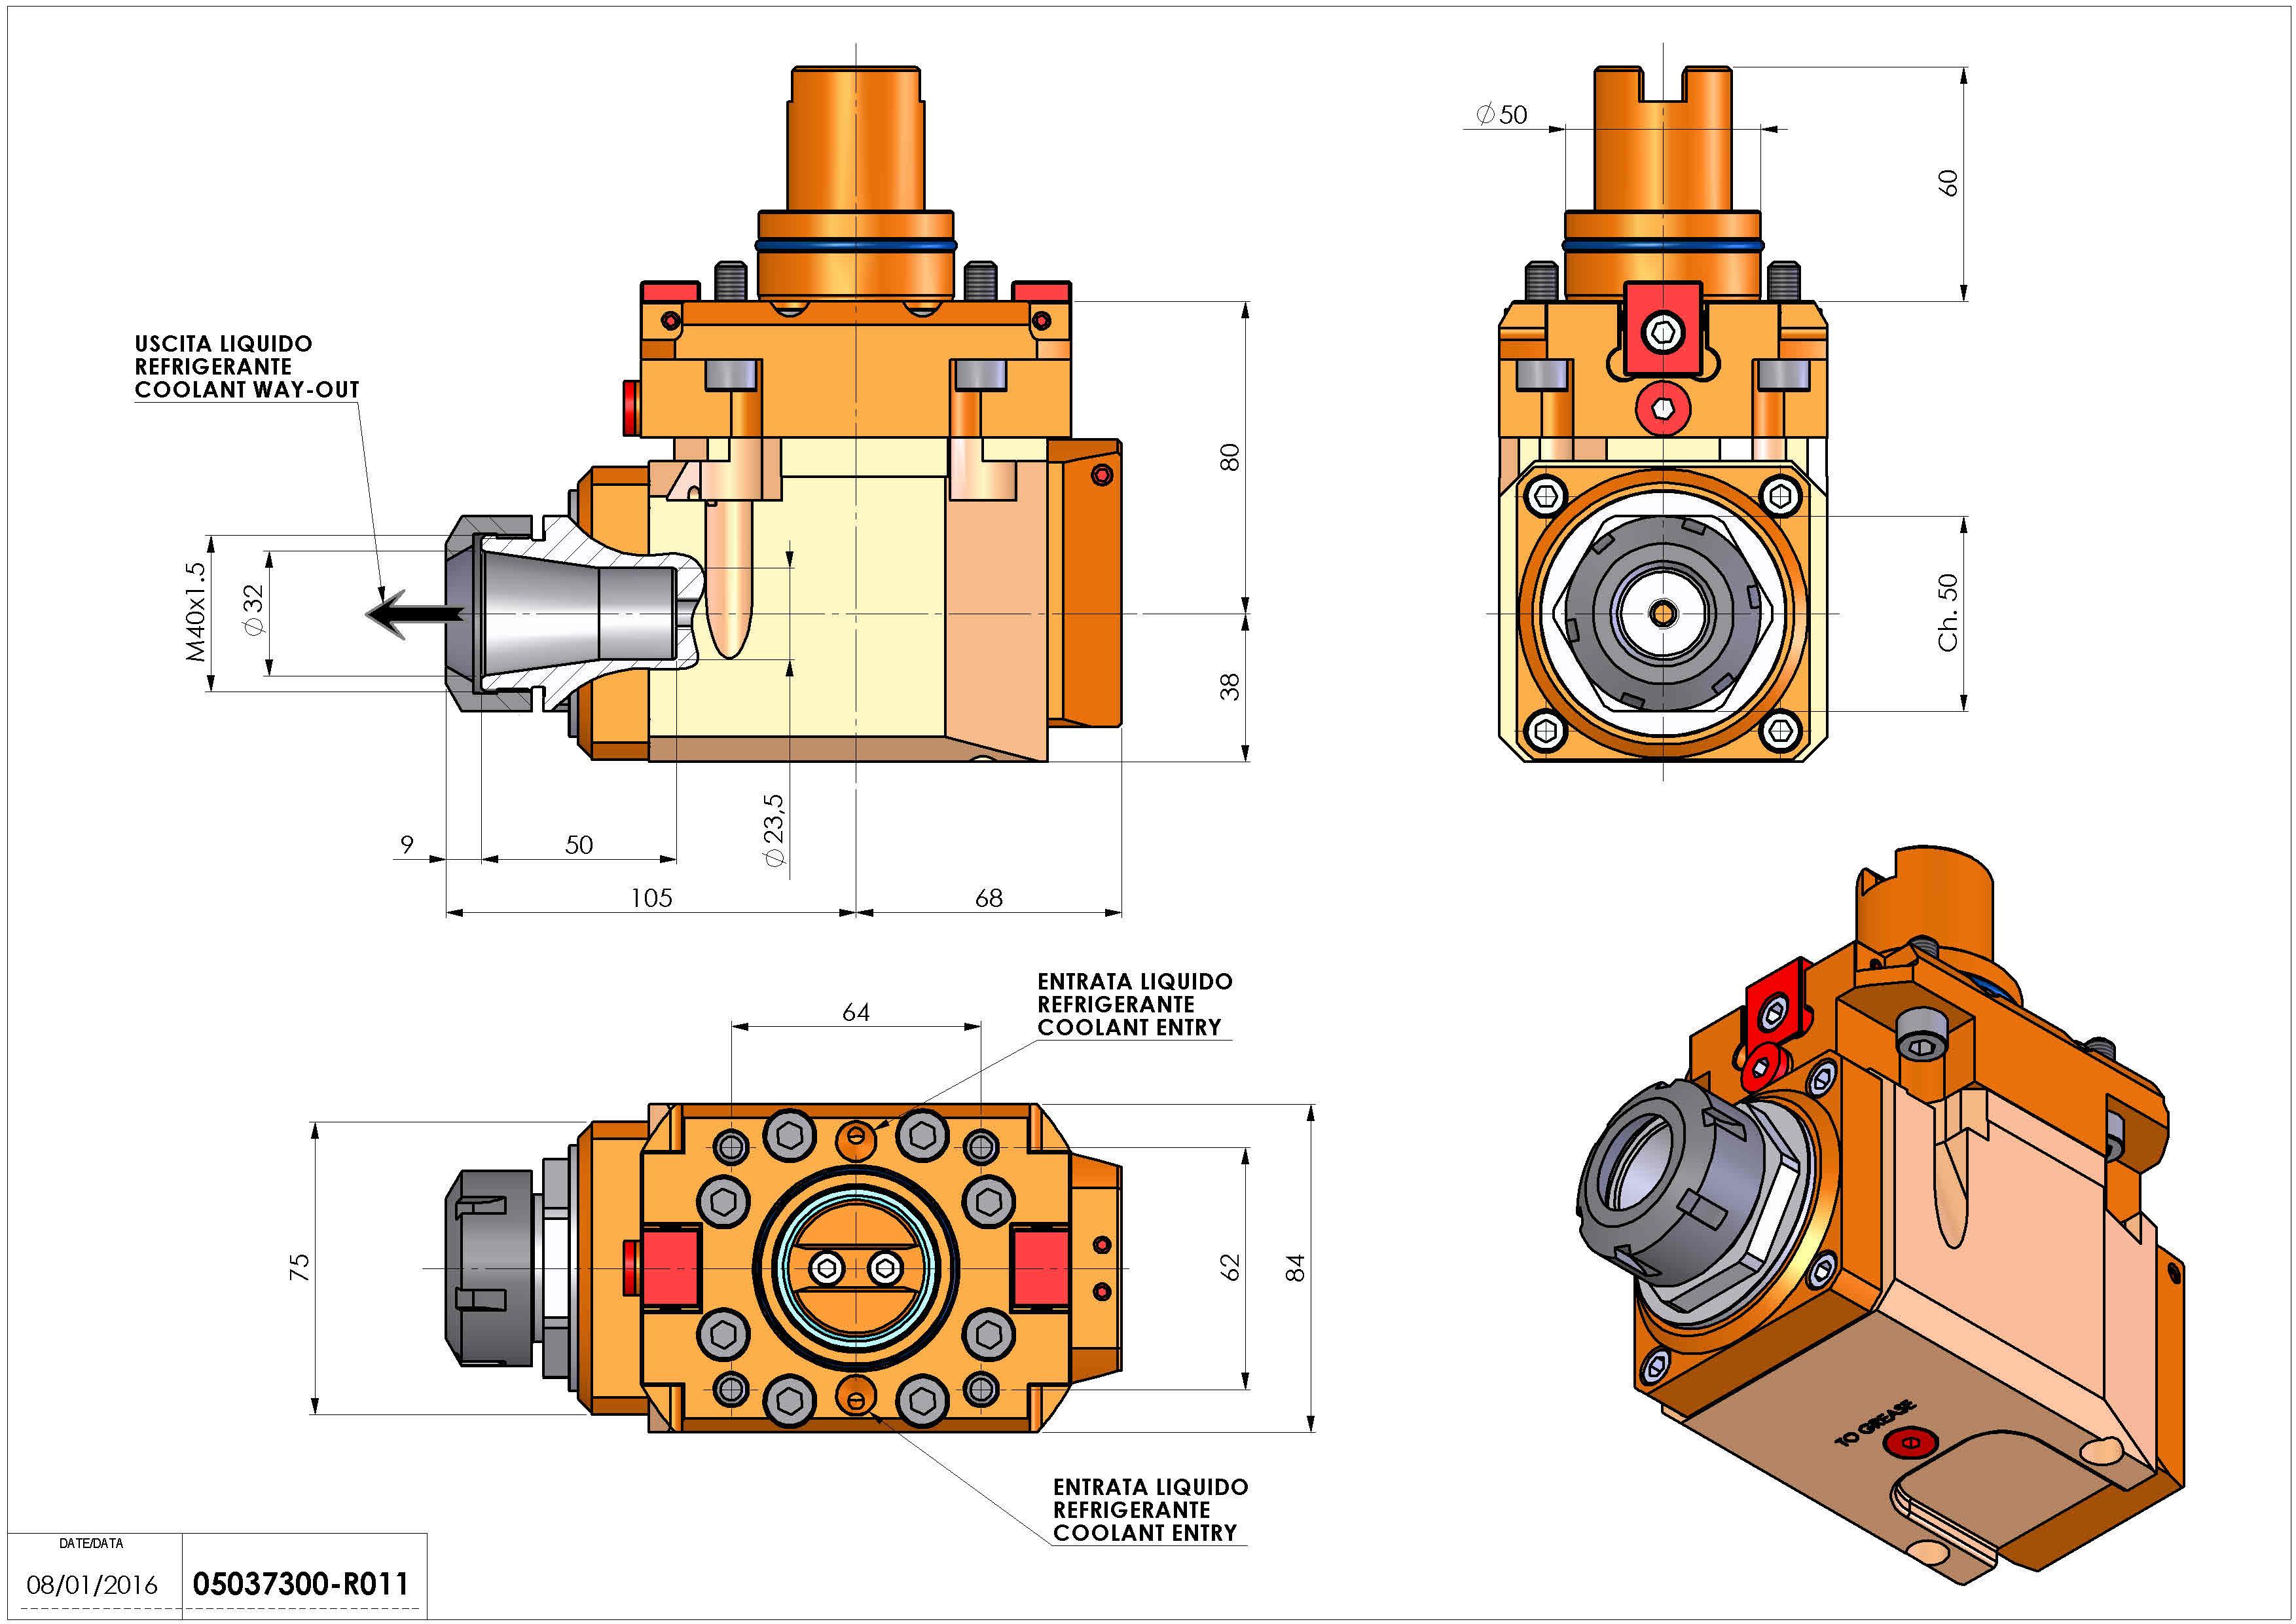 Technical image - LT-A D50 ER32 RF H80 TW.